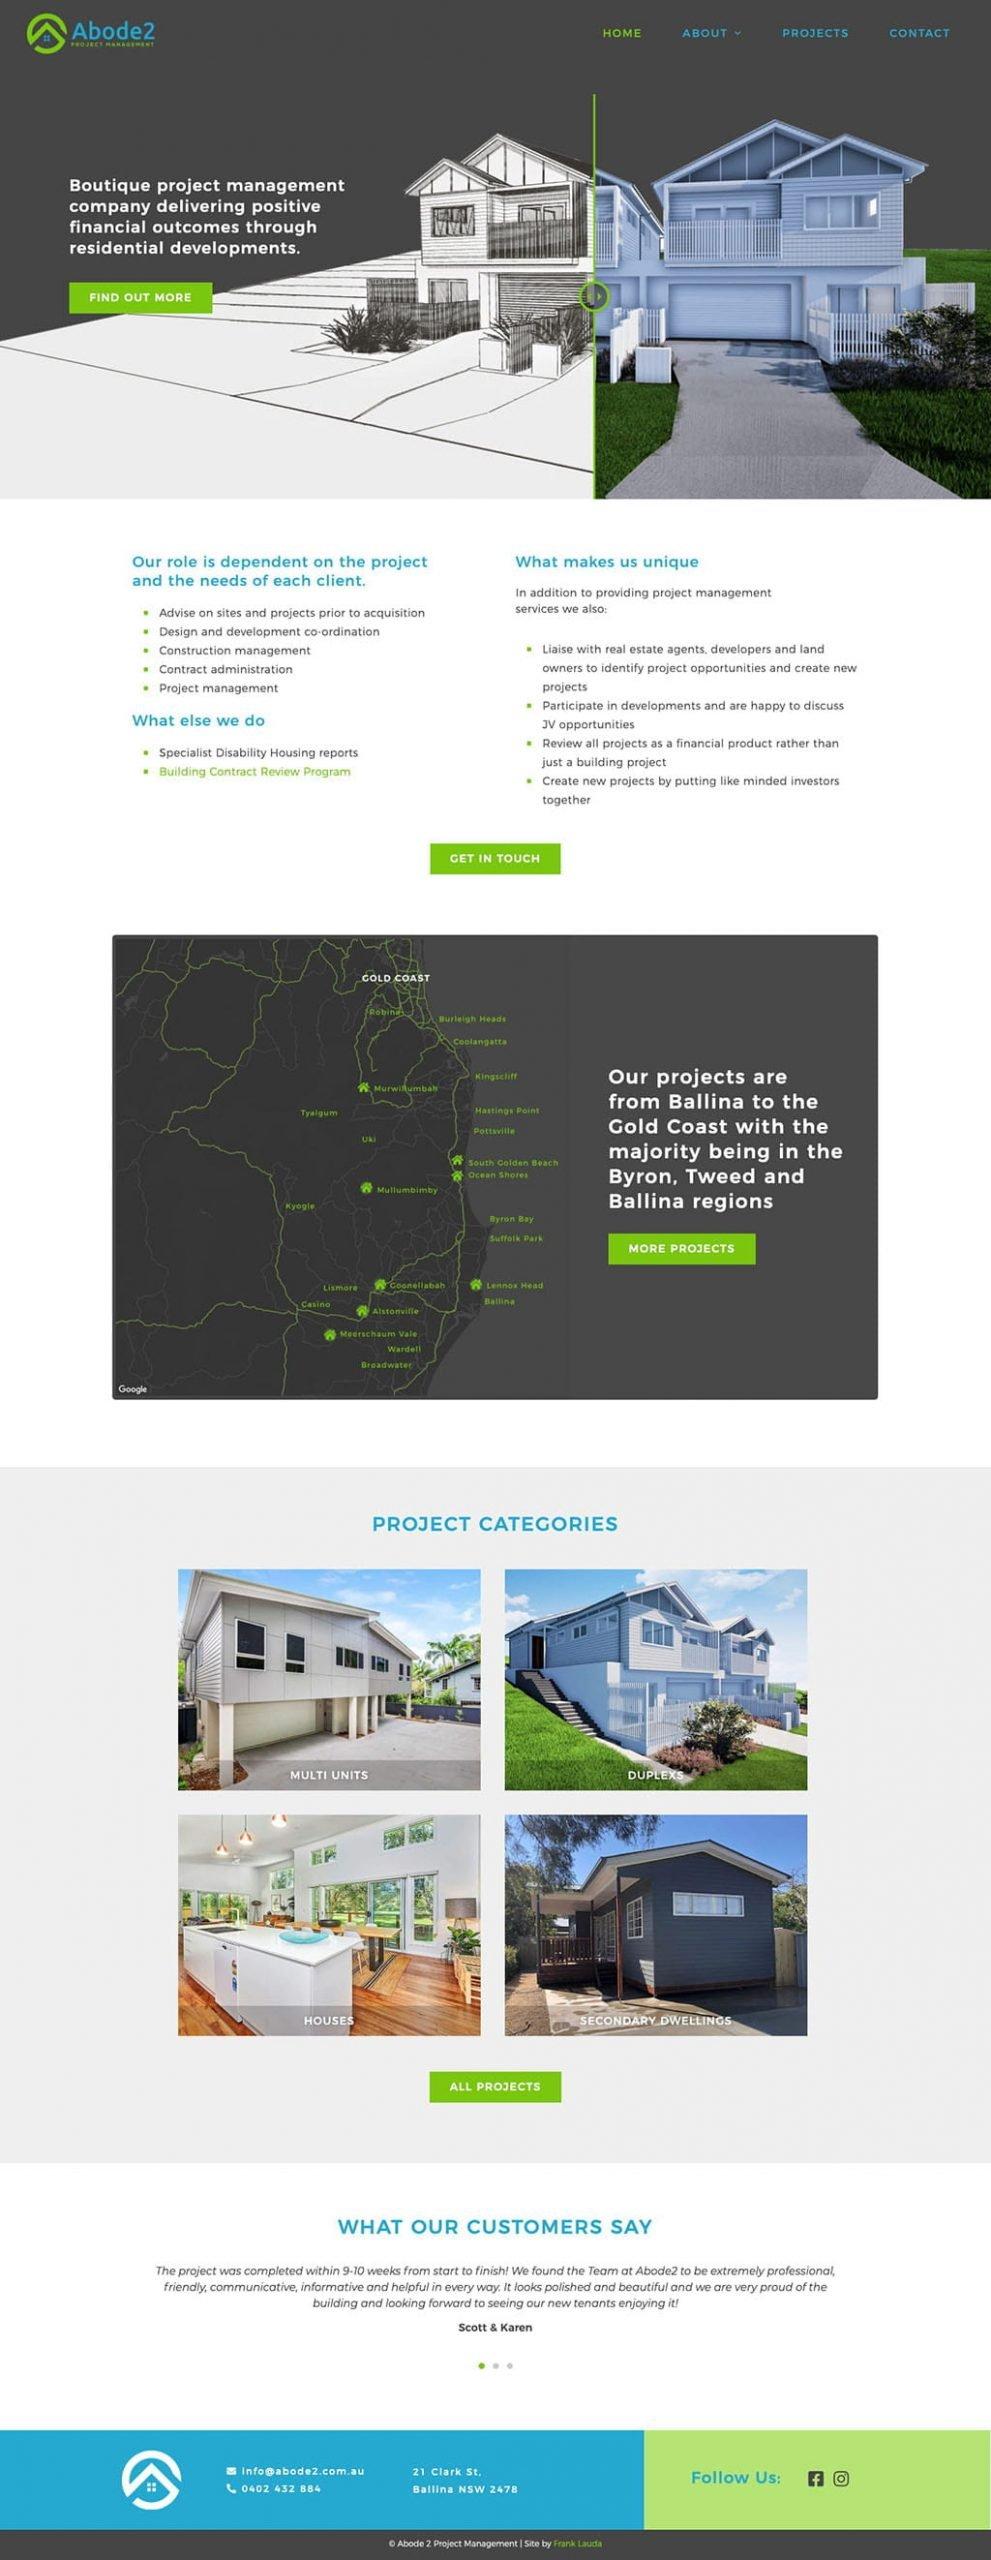 abode2 project management website